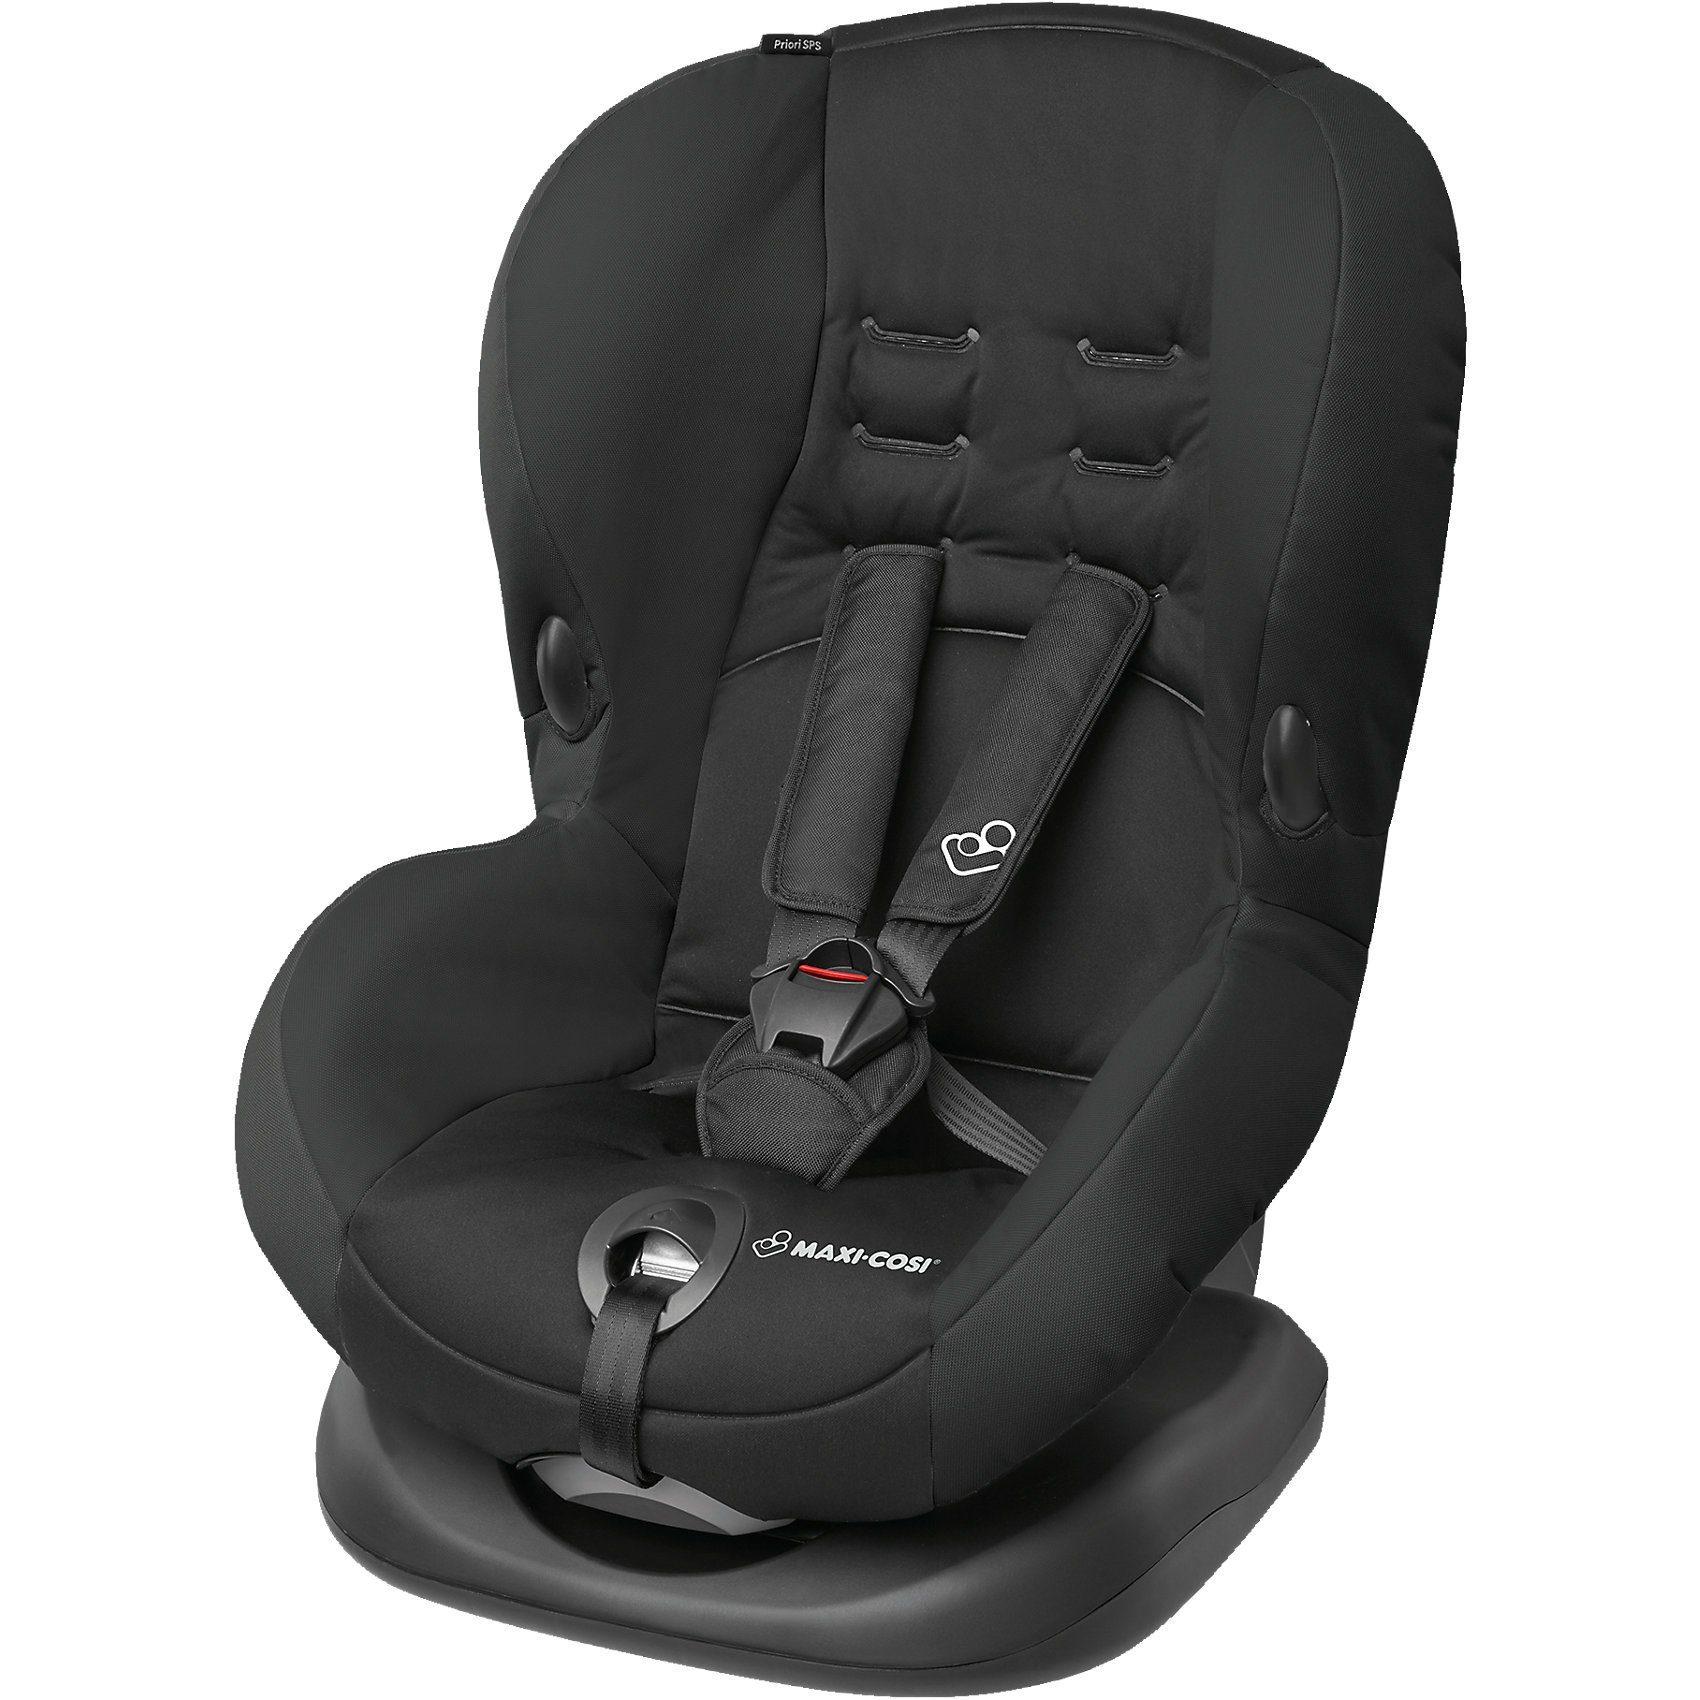 Maxi-Cosi Auto-Kindersitz Priori SPS+, Slate Black, 2017